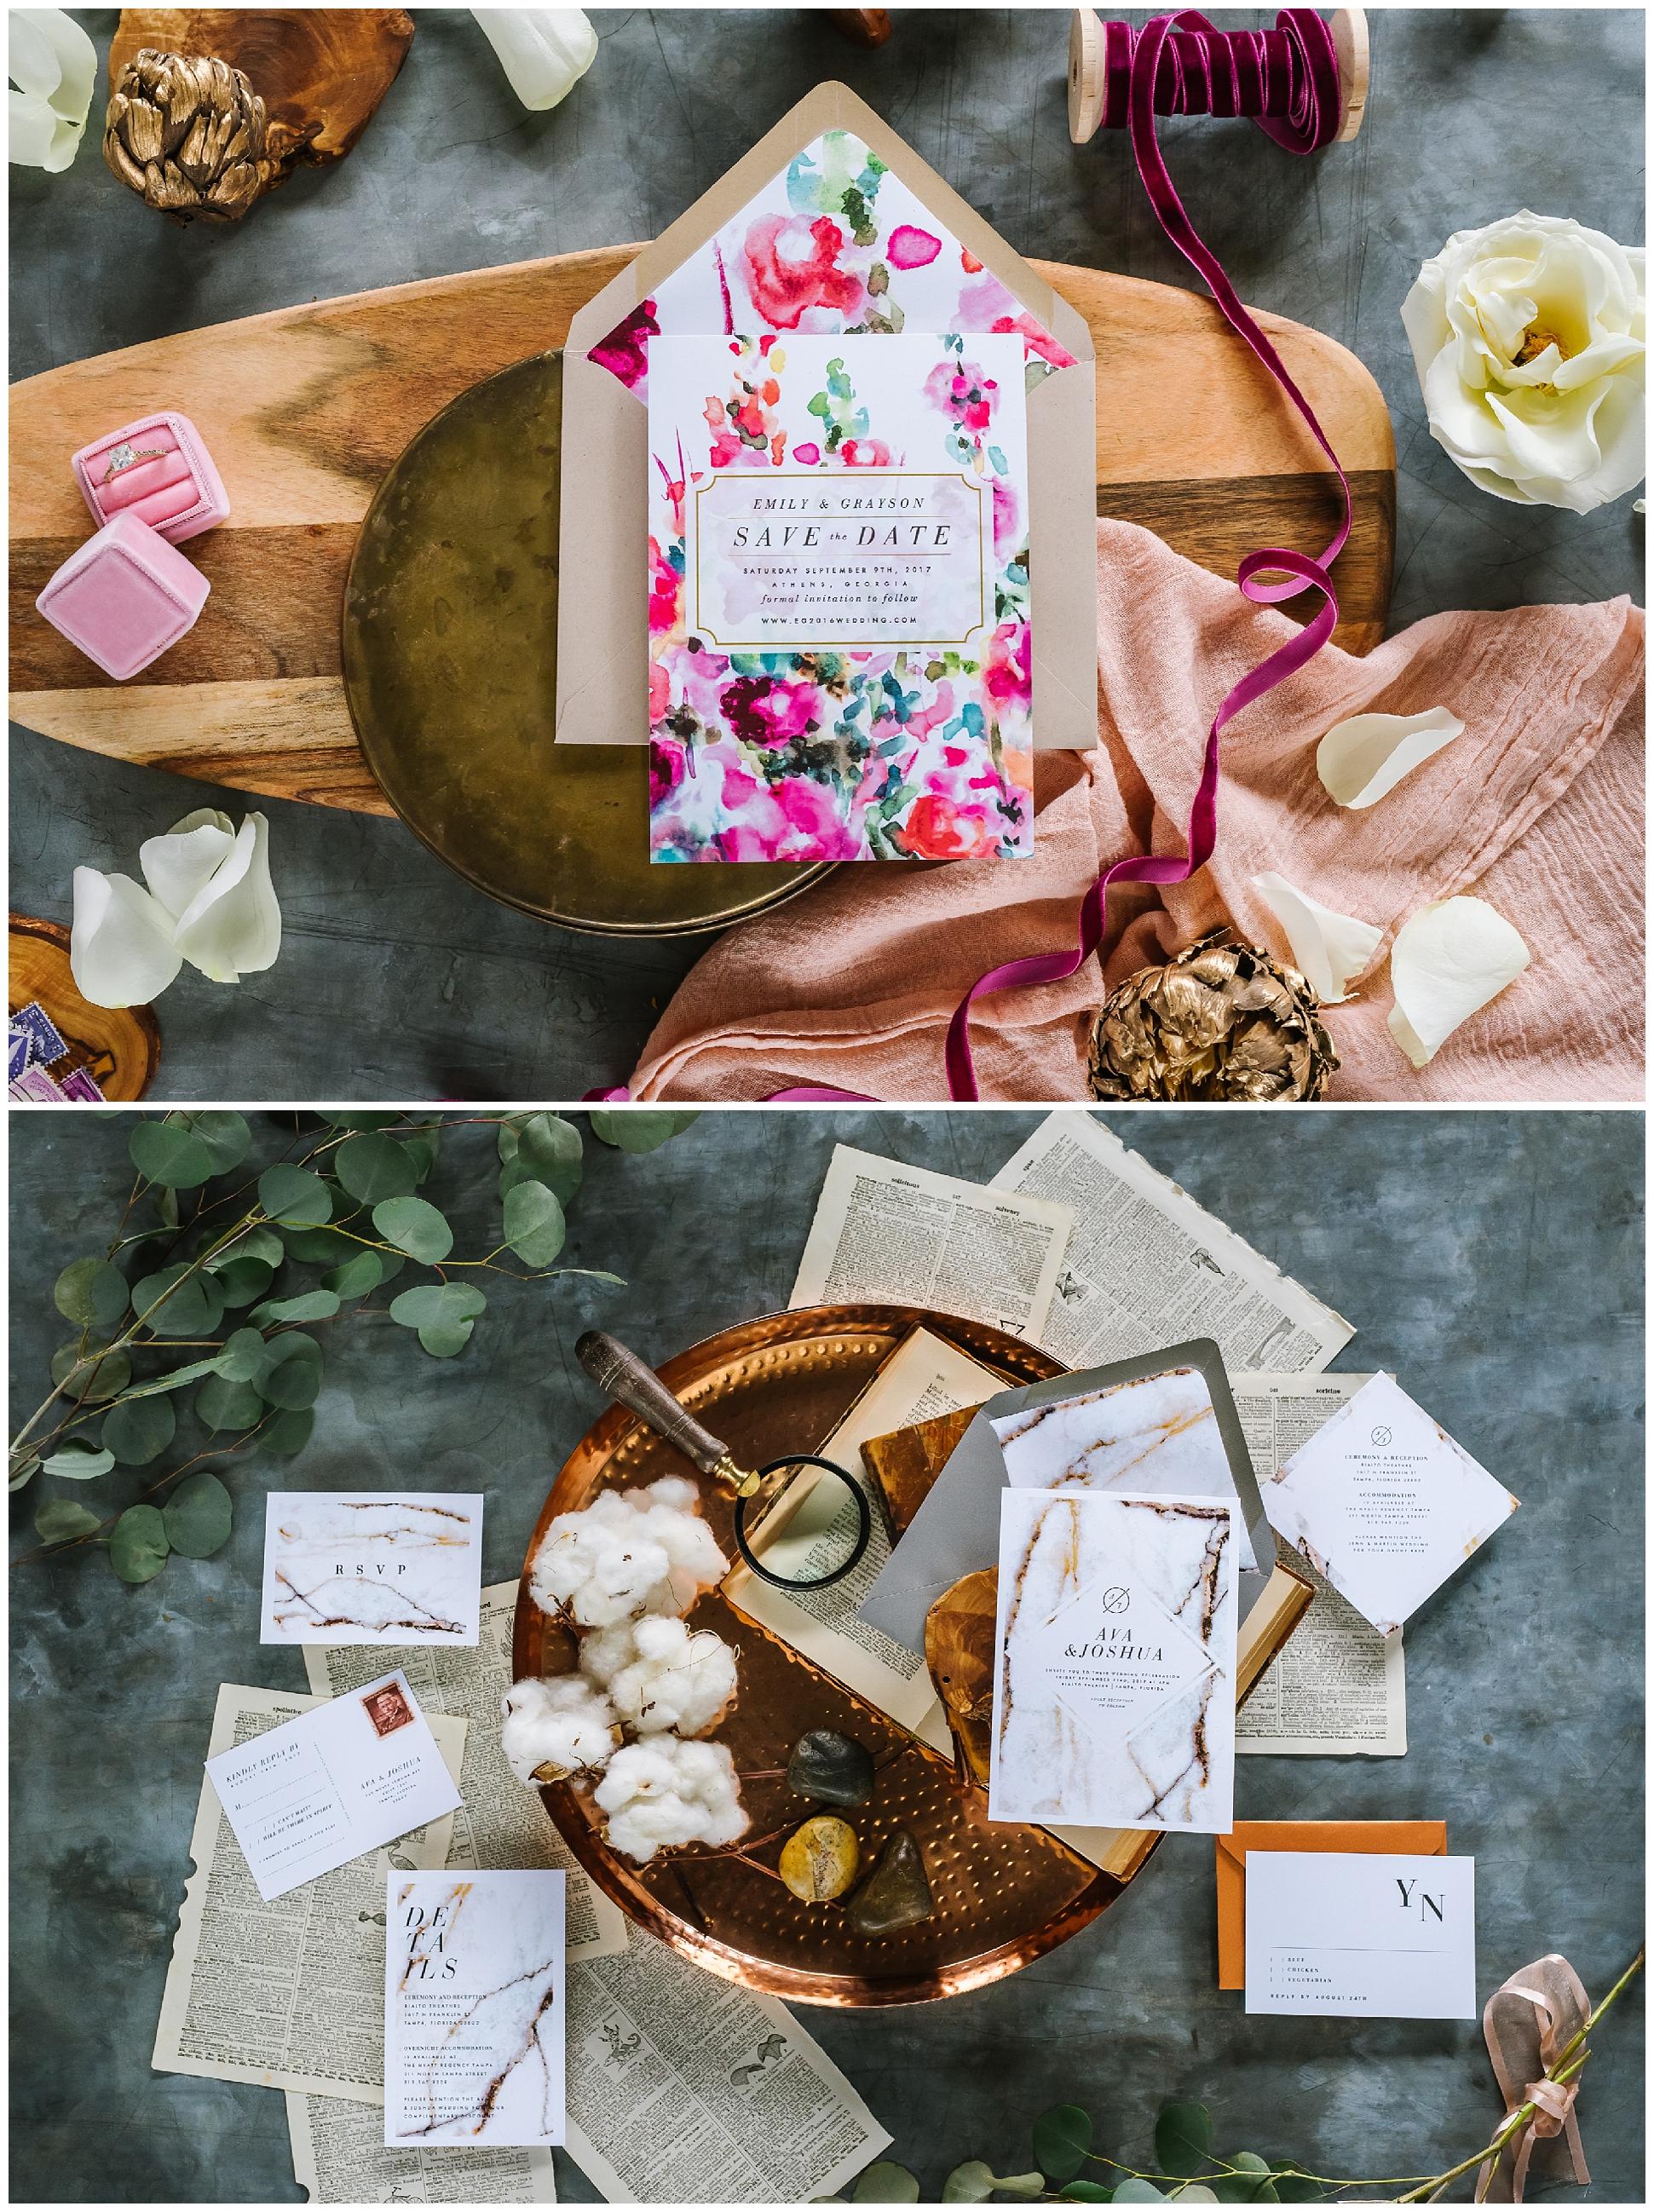 Ashlee-hamon-photography-year-in-review-2016-travel-wanderlust-vsco-adventure-wedding_0047.jpg